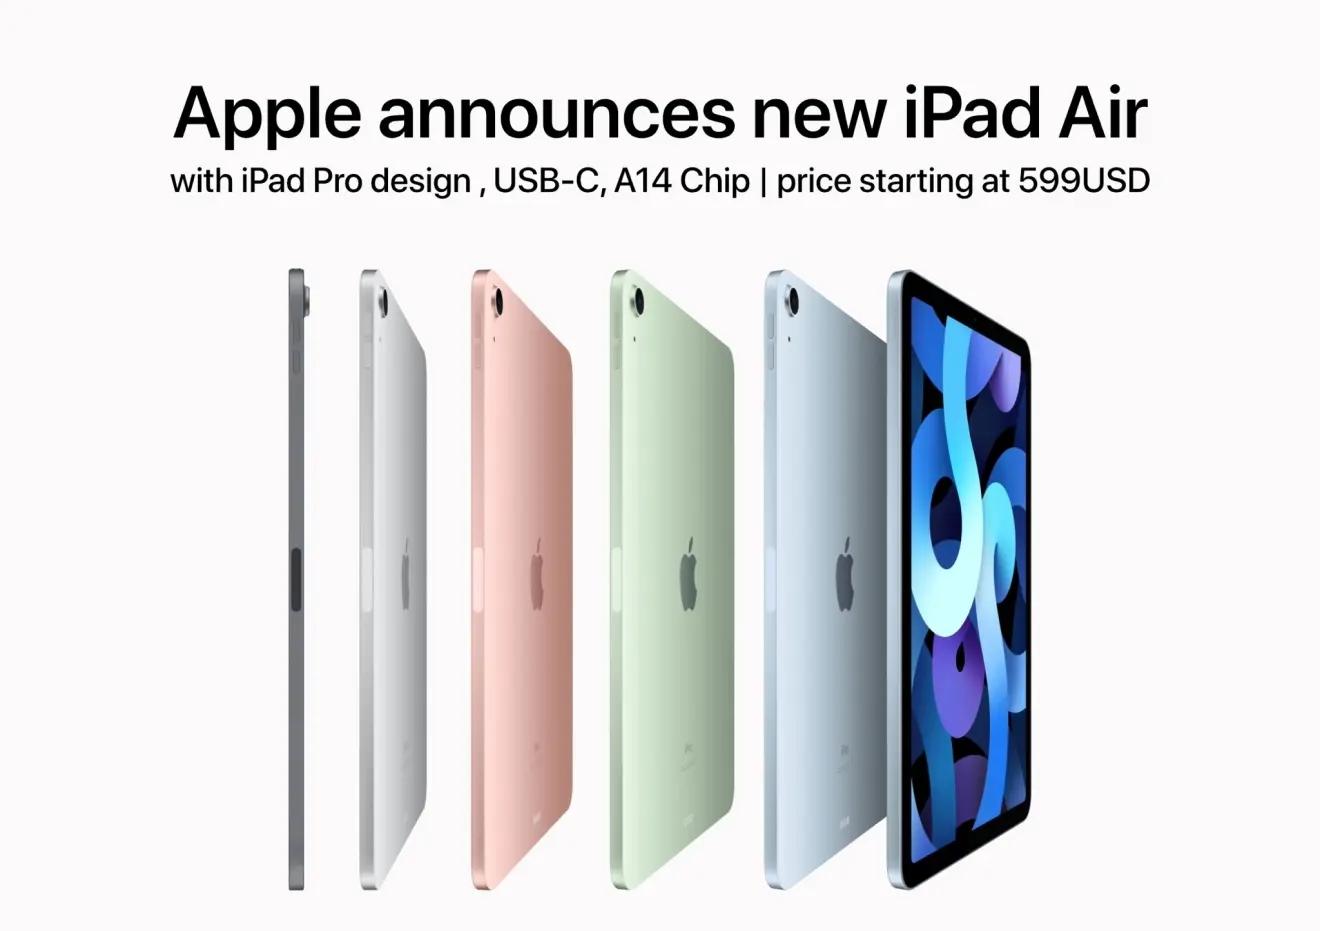 iPadAir4对比iPadAir3对比,iPadAir4值得入手吗